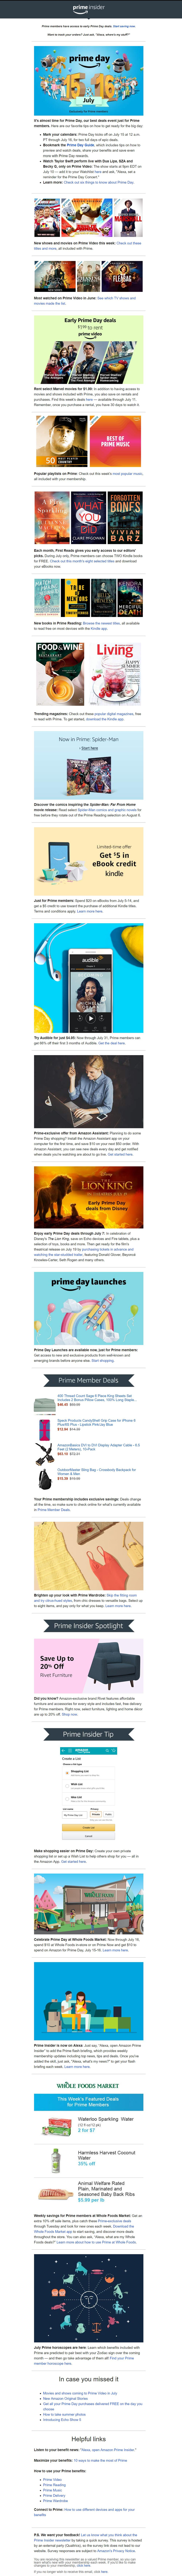 Amazon newsletter Prime Insider for Prime Day